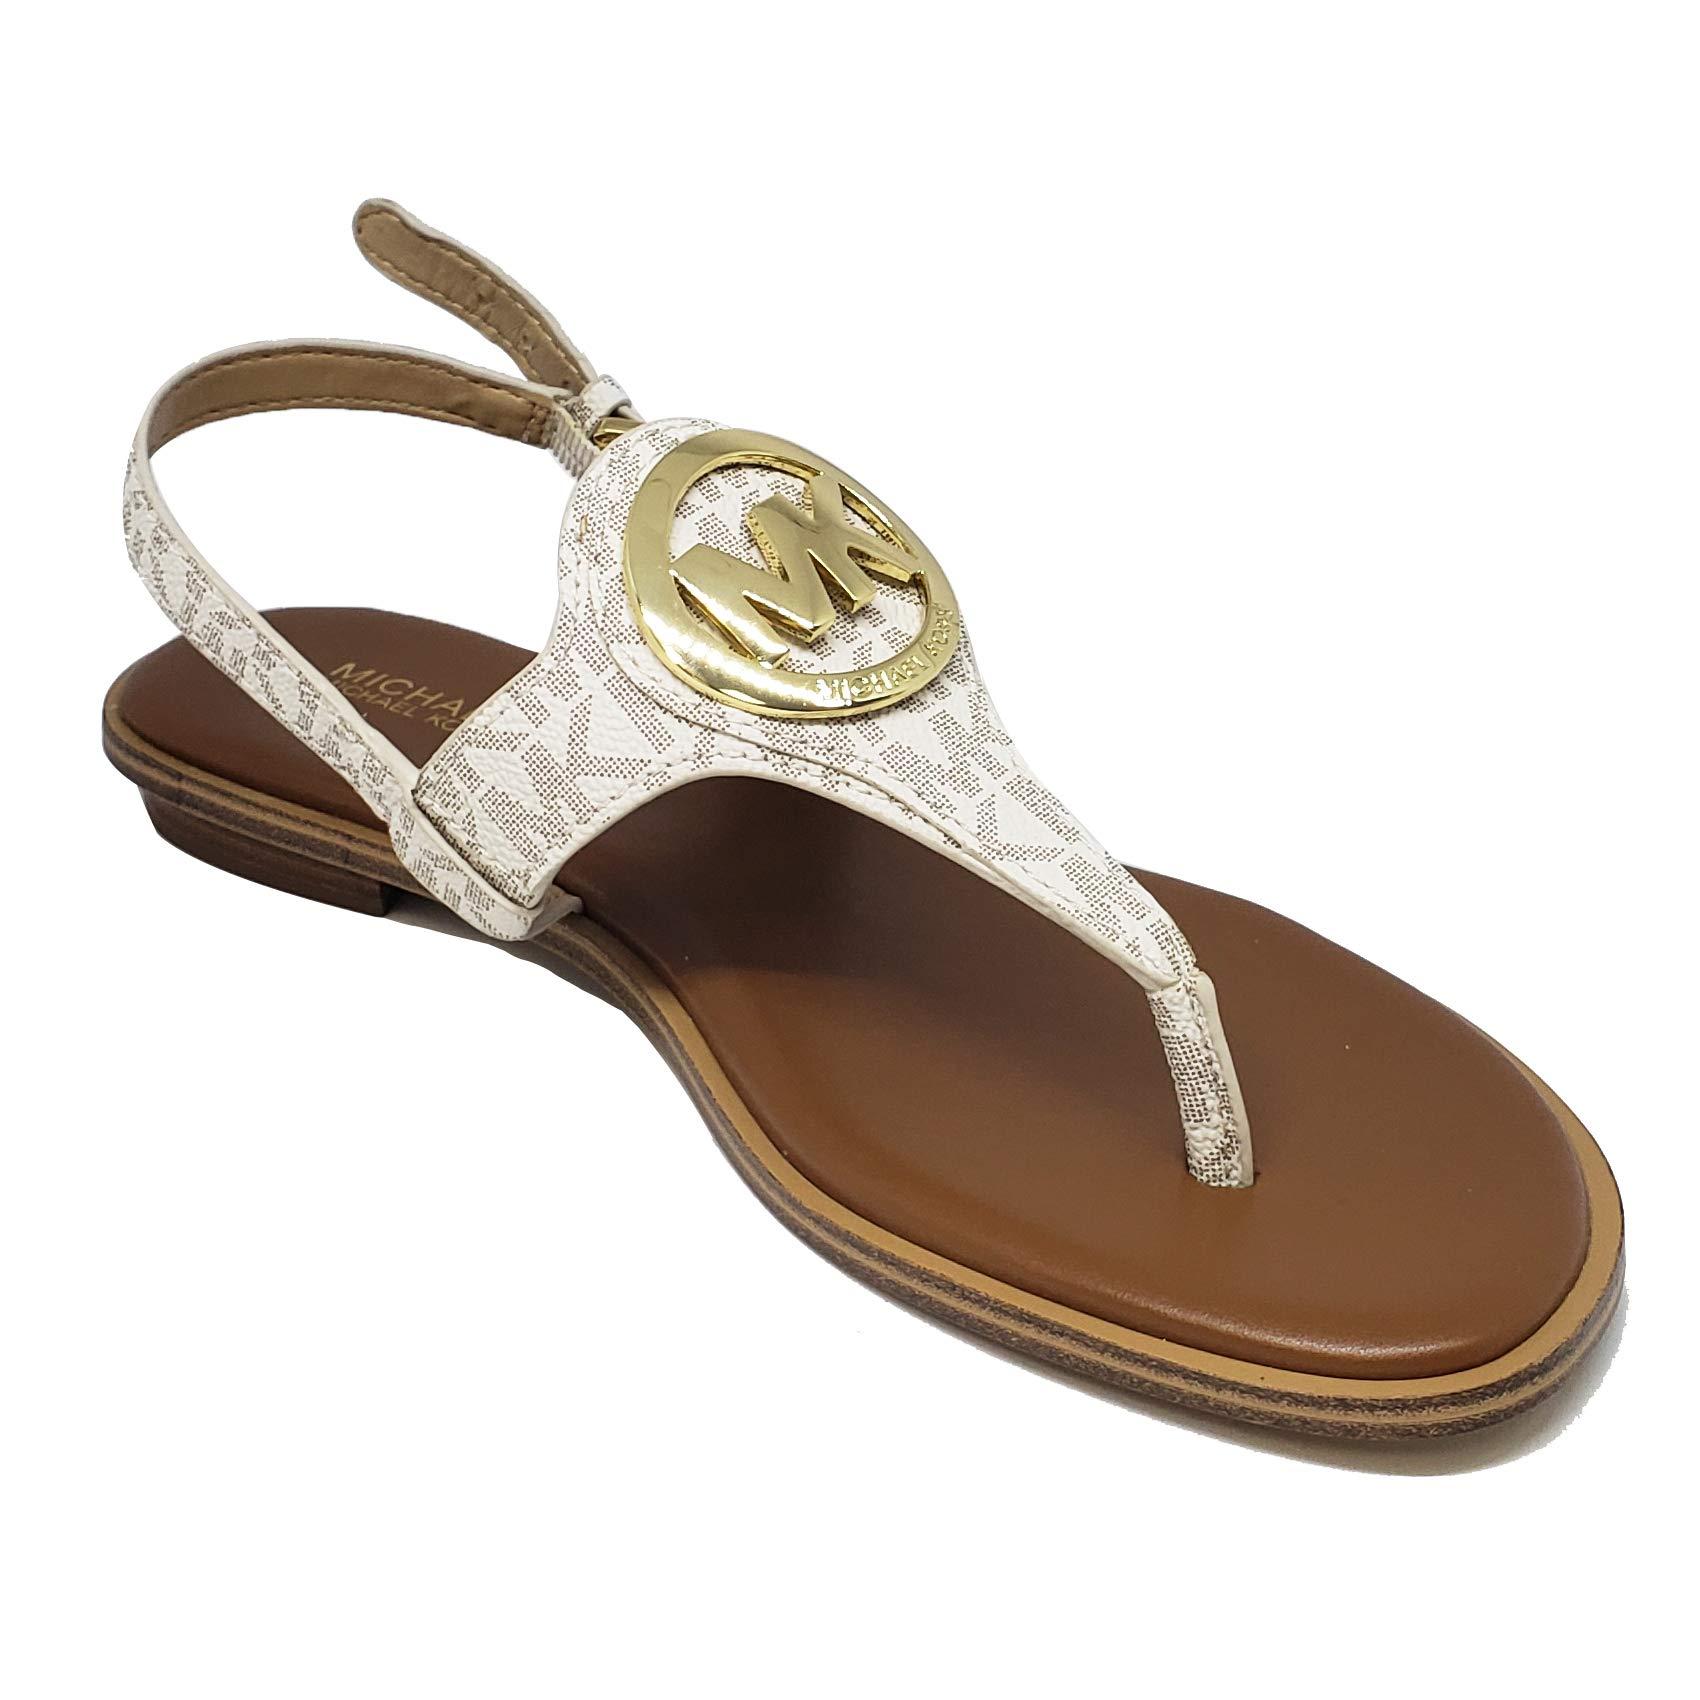 Michael Kors Aubrey Charm Thong Sandals